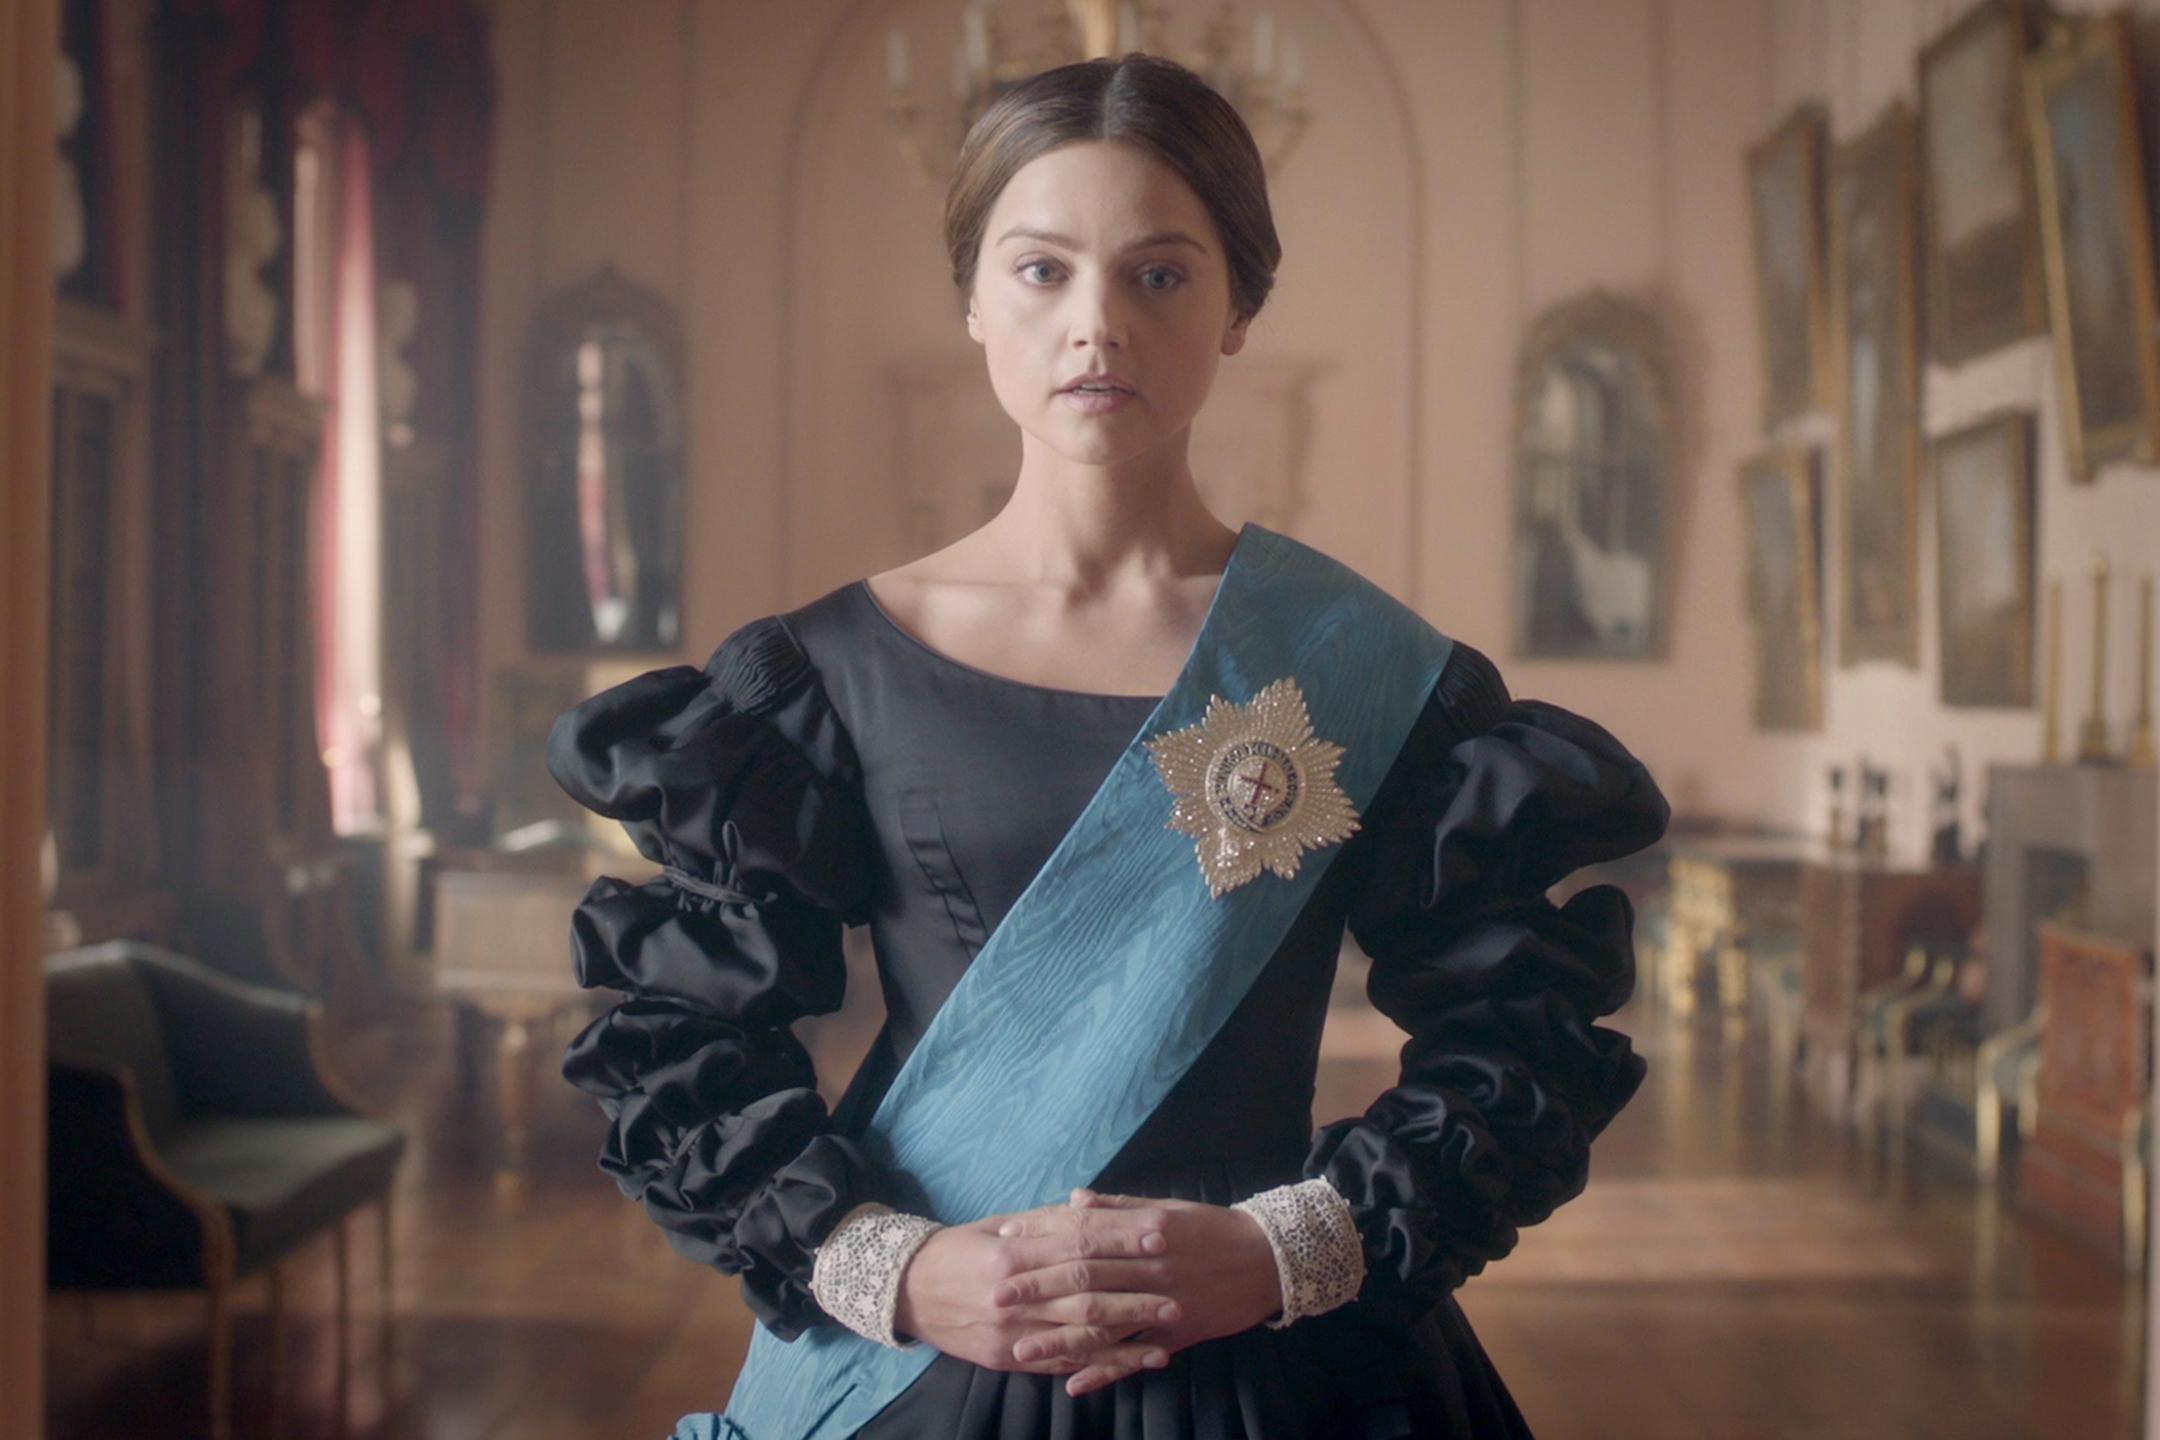 British television drama Victoria premieres on PBS on Jan. 15